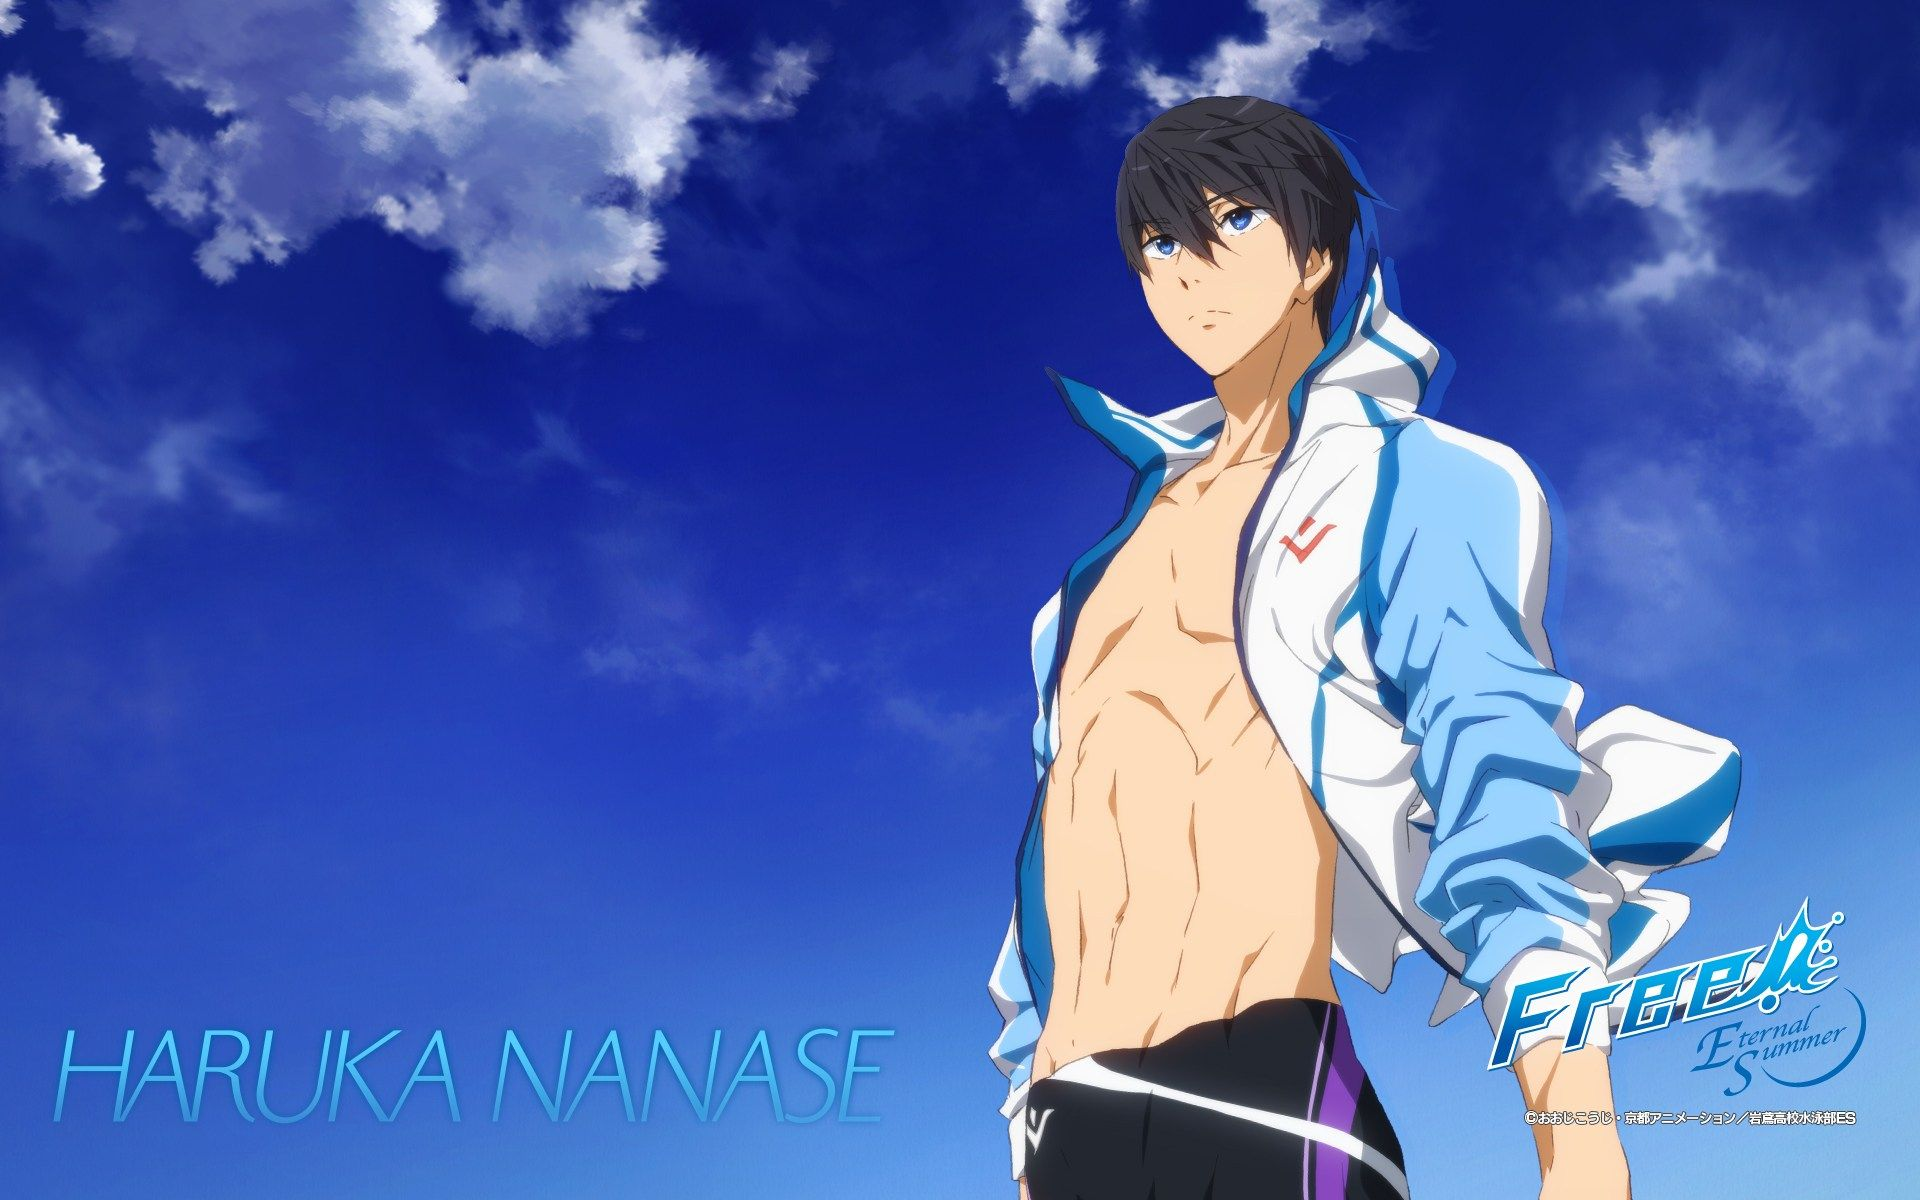 Haruka Nanase Wallpapers Top Free Haruka Nanase Backgrounds Wallpaperaccess